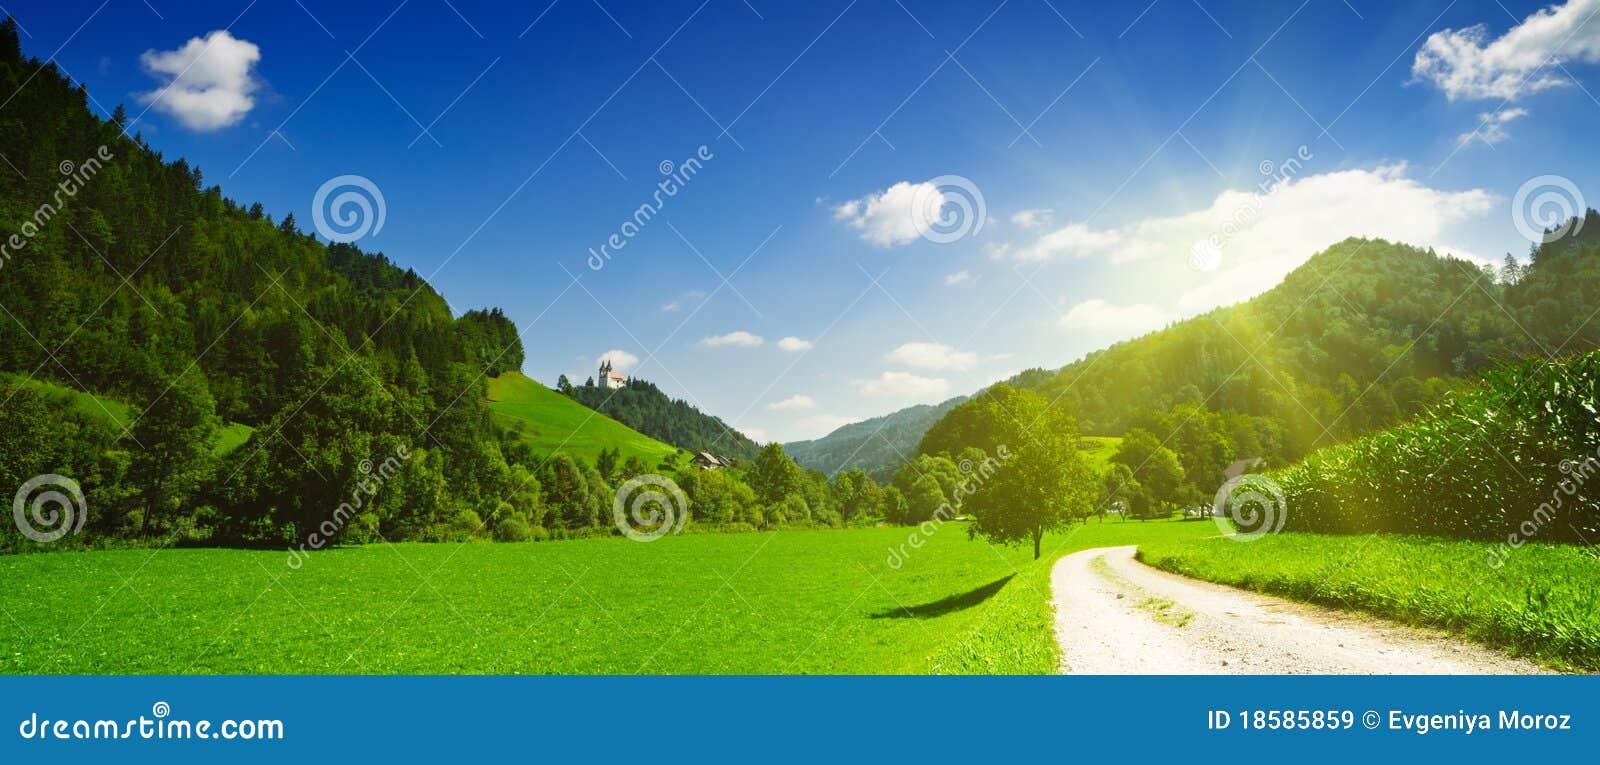 Idyllic countryside panoramic view